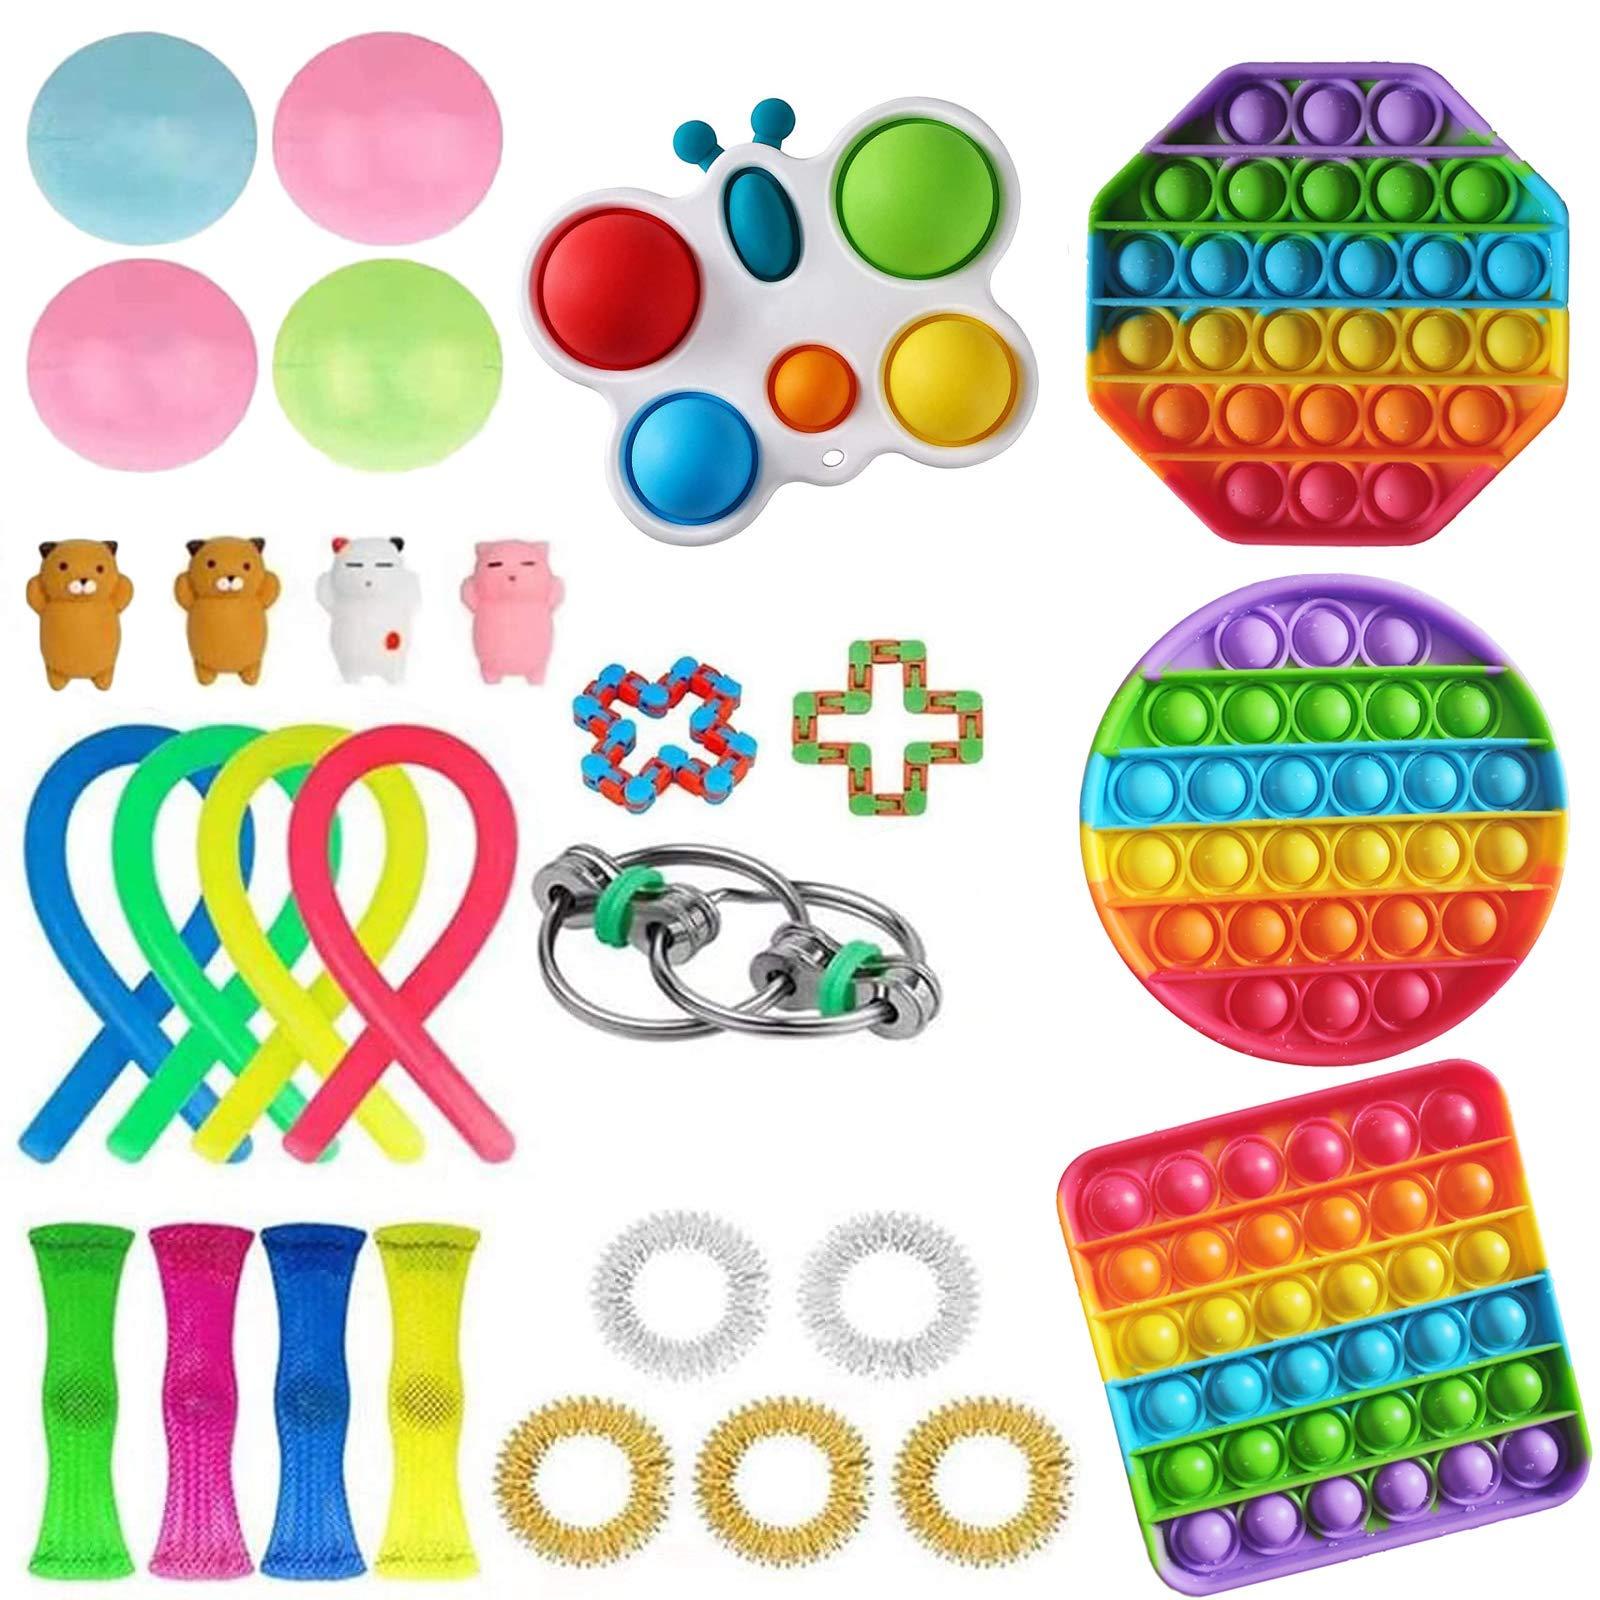 Elippeo Fidget Toys Set, Simple Dimple Fidget Toy 25 Packs Cheap, Push Pop Bubble Sensory Toy, Fidgeting Game Kill Time Tools for Kids and Adults (A-1 Fidgets Box)